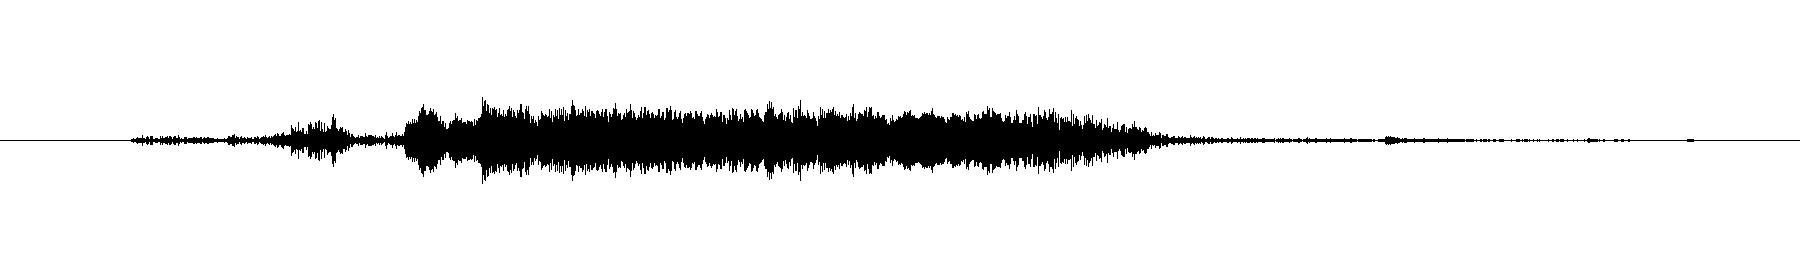 damn  sound effect